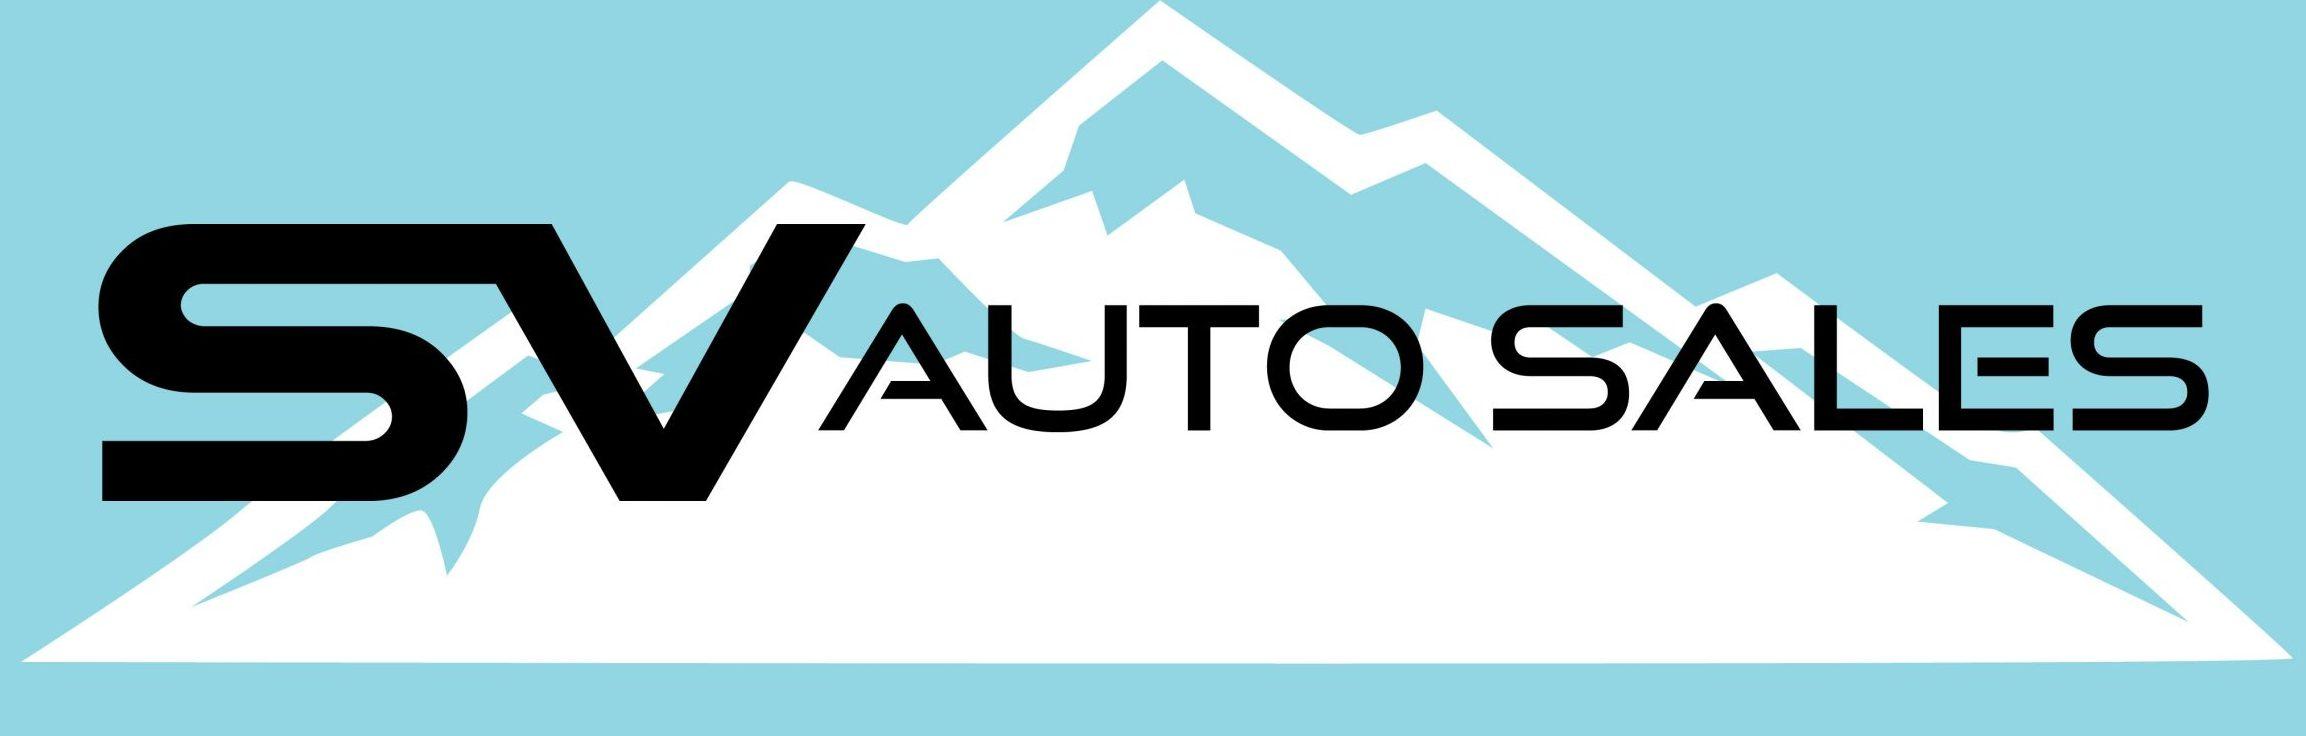 SV Auto Sales